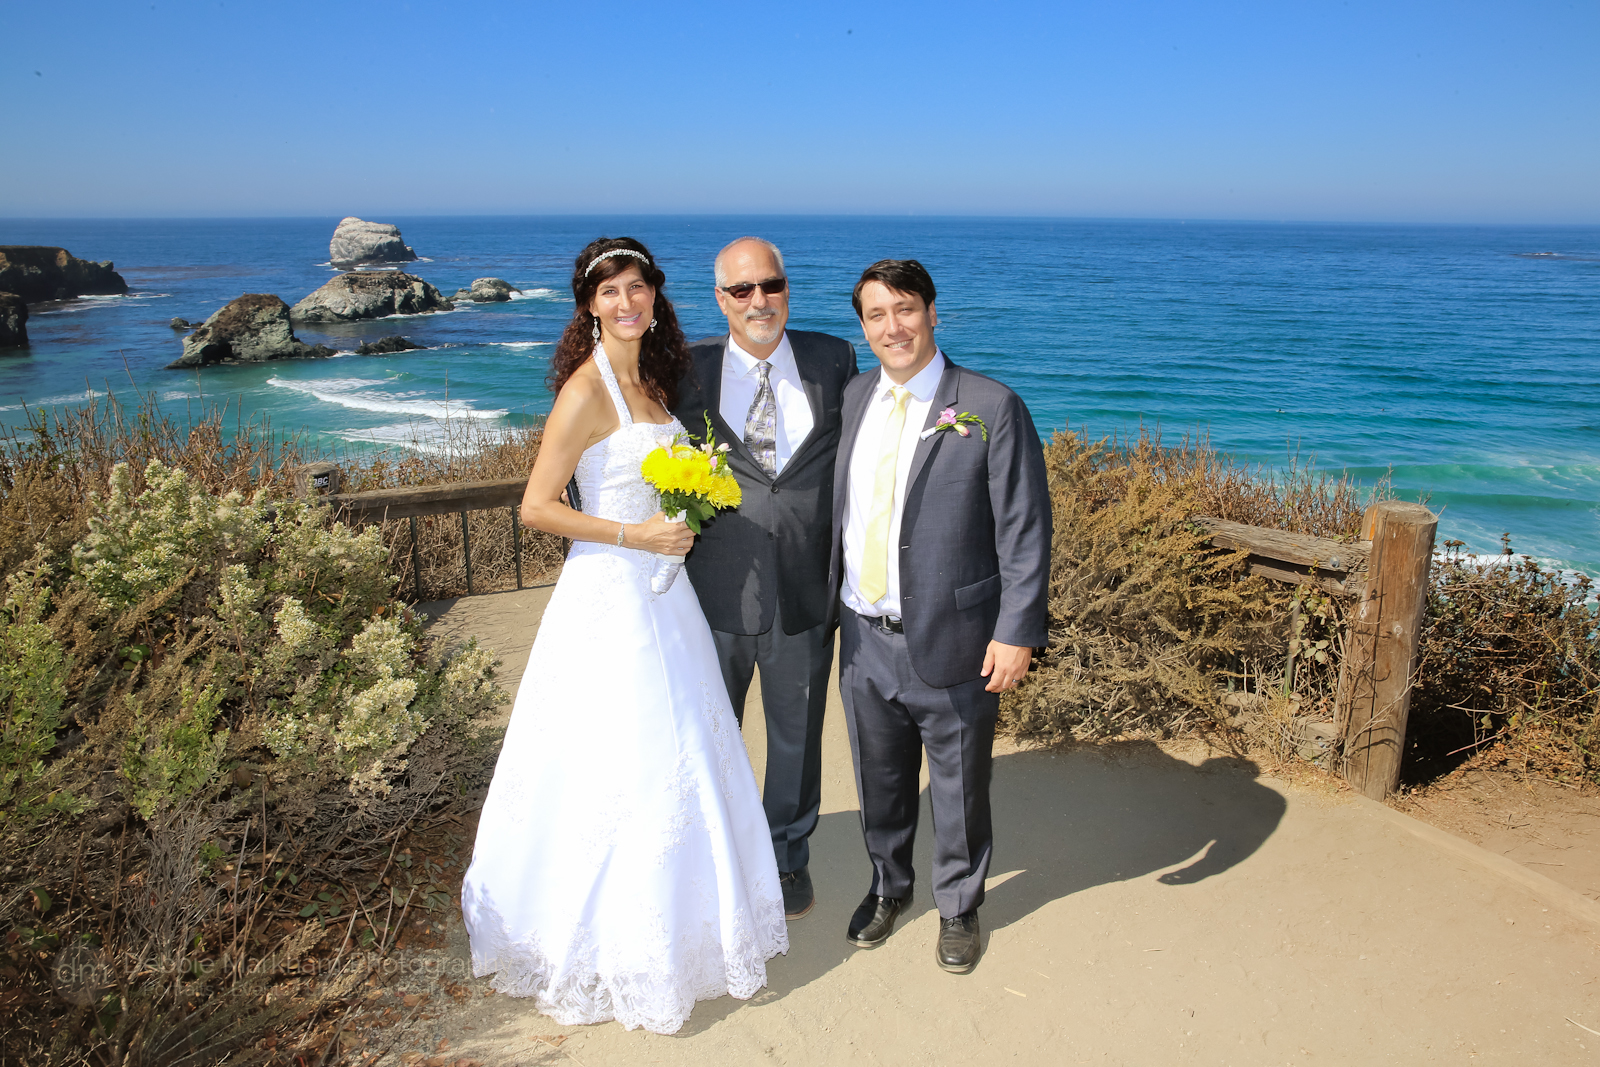 destination-wedding_small-wedding_big-sur_california-coast_ocean-view_gorda_wedding-photographer_debbie-markham-4316